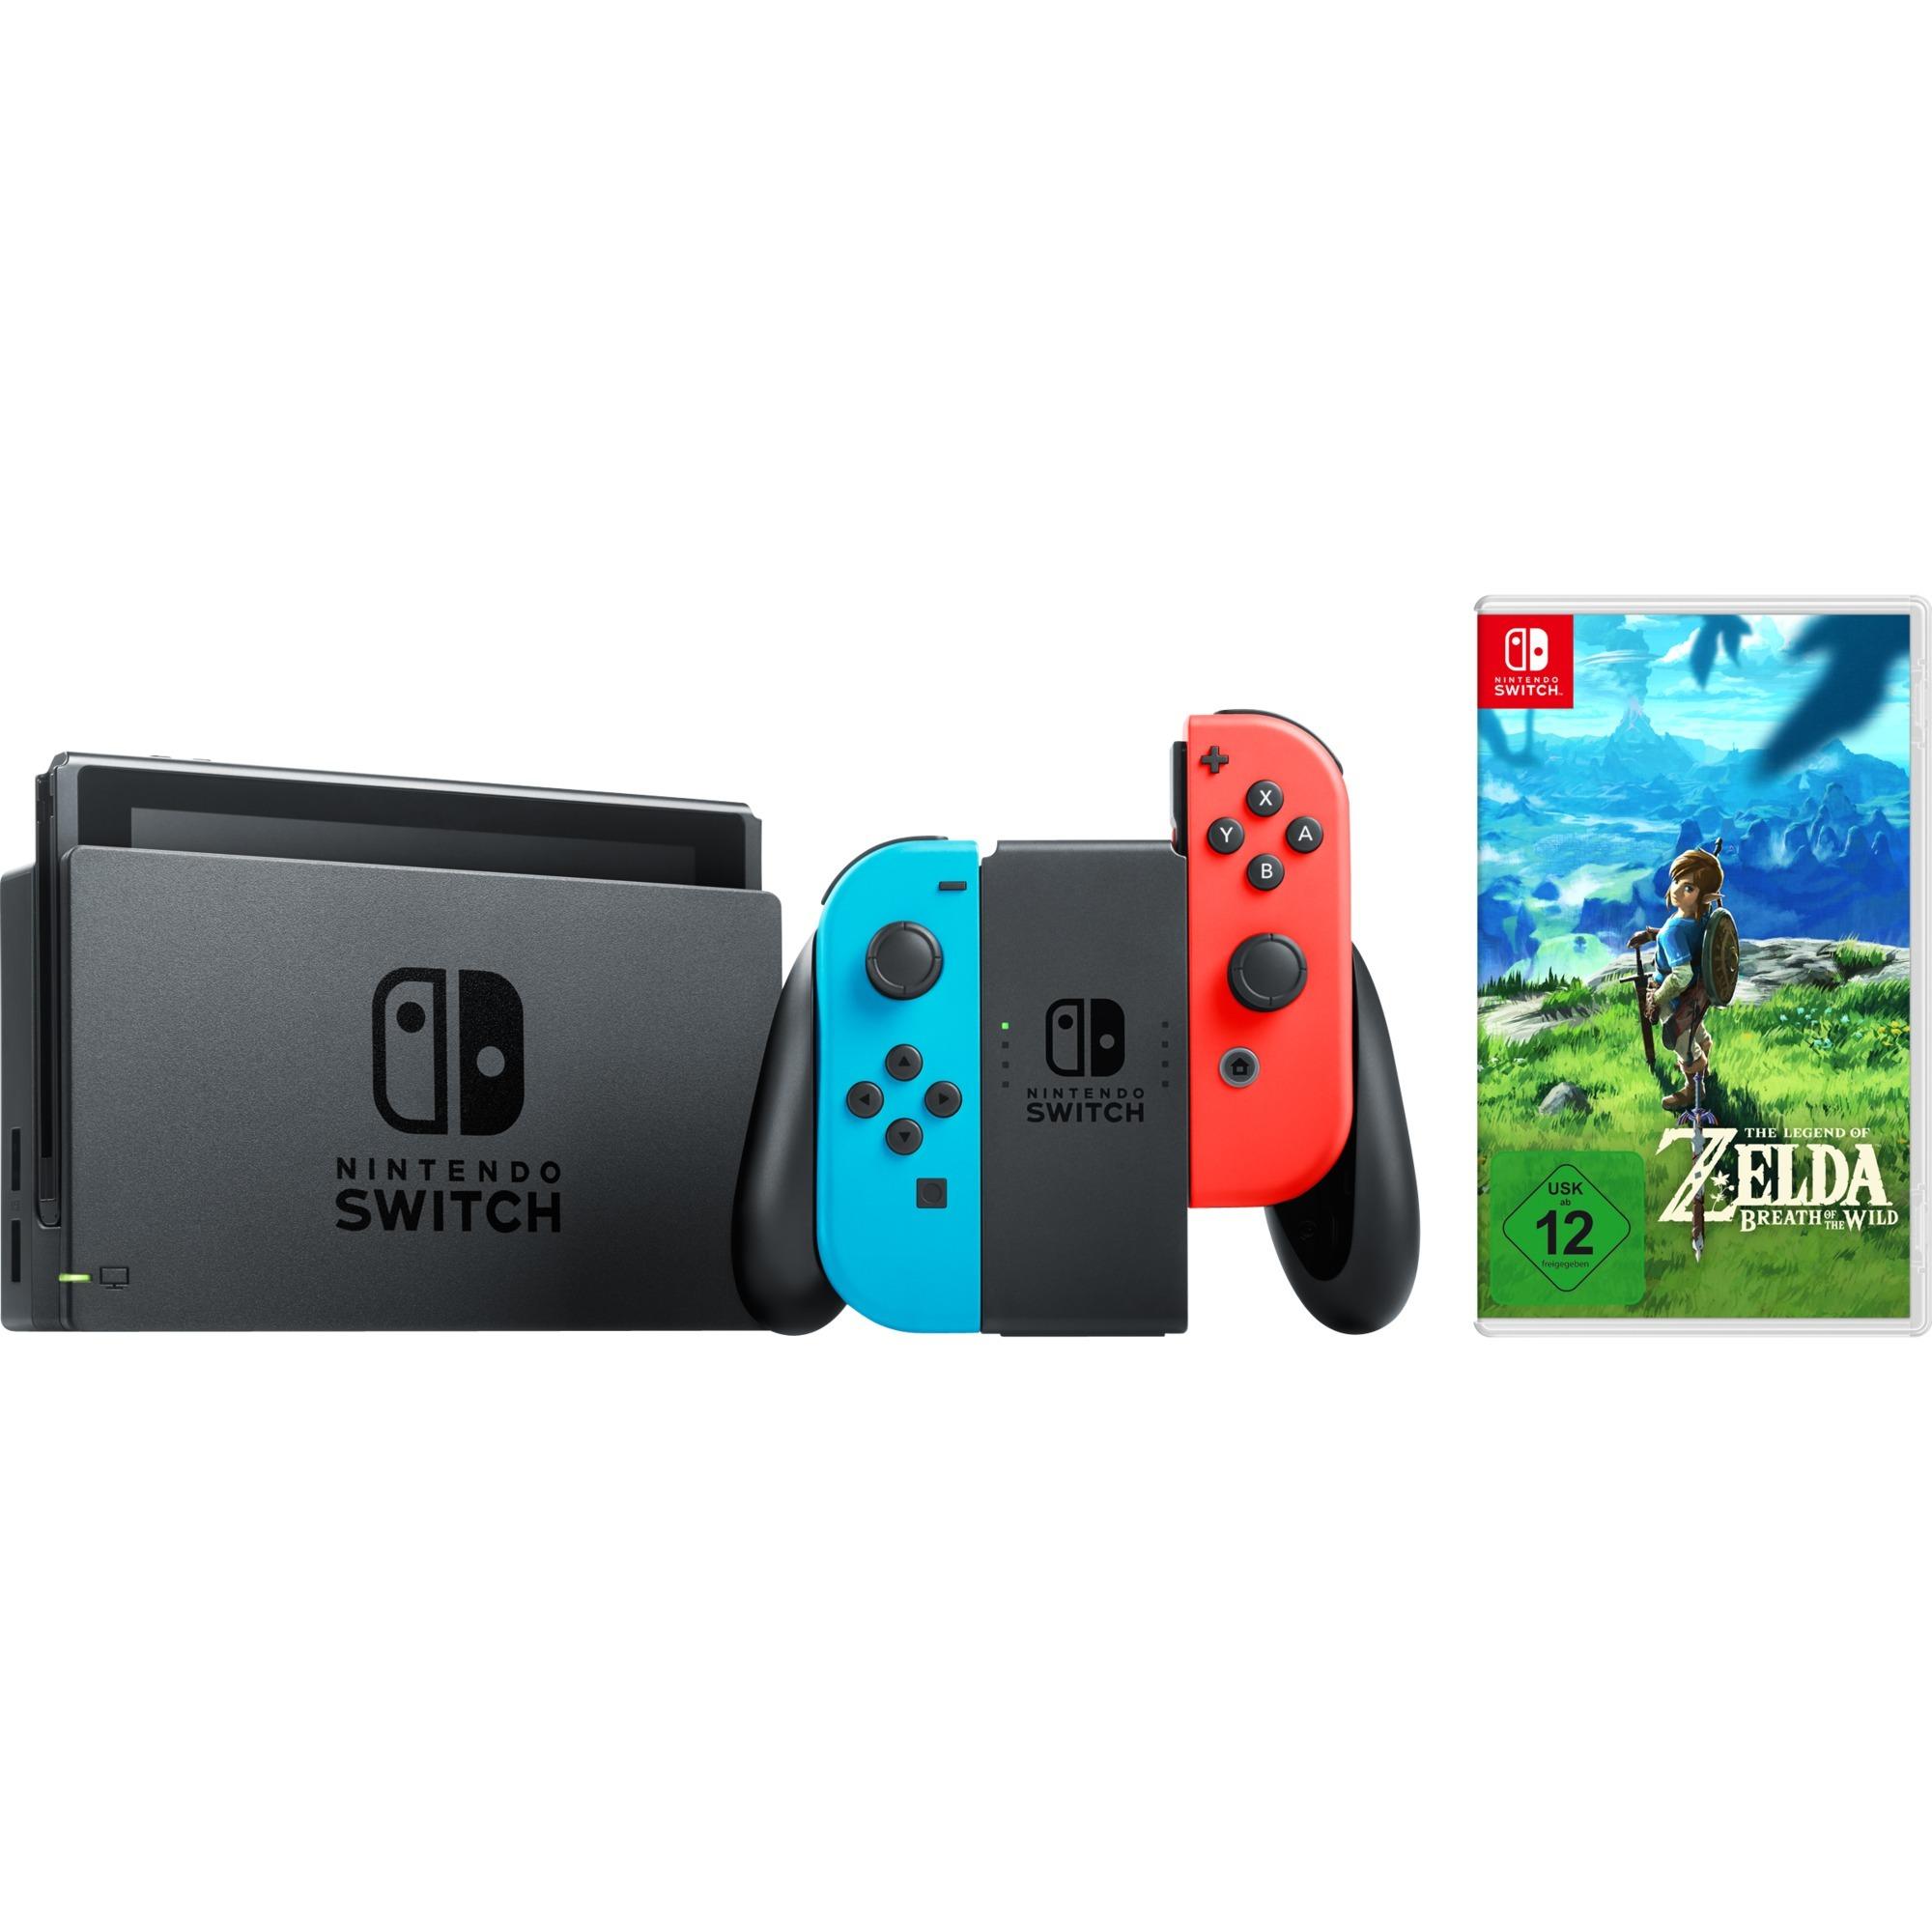 Switch + Zelda Breath of the Wild, Videoconsola